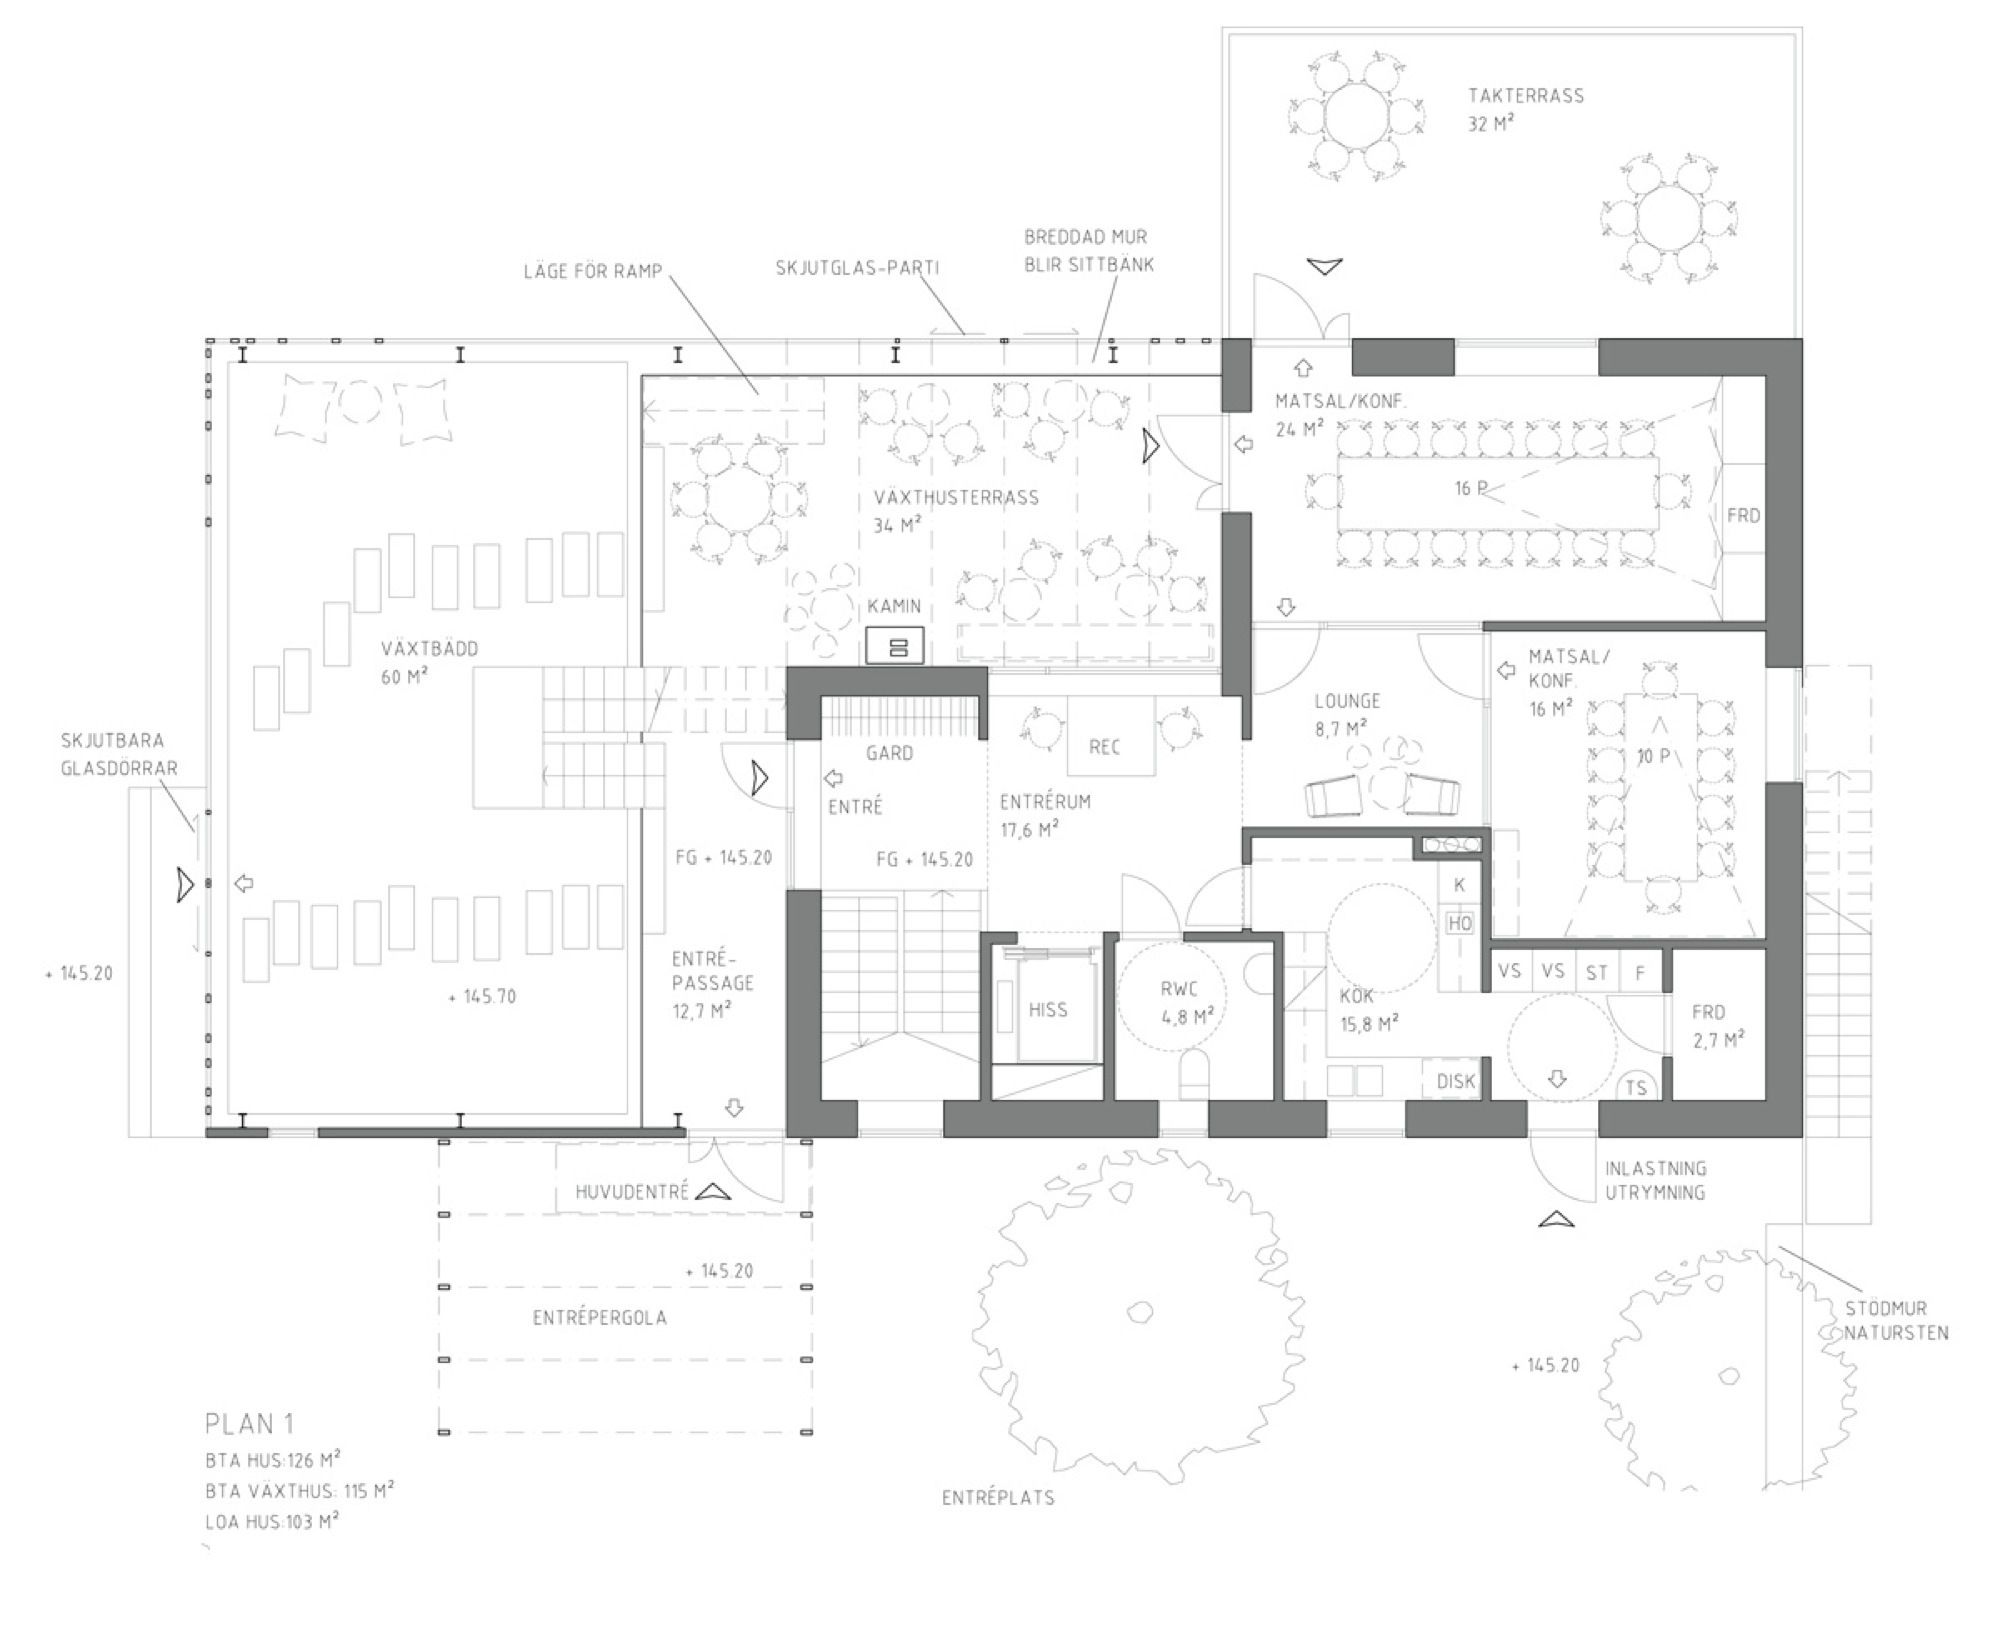 Sala phuket design